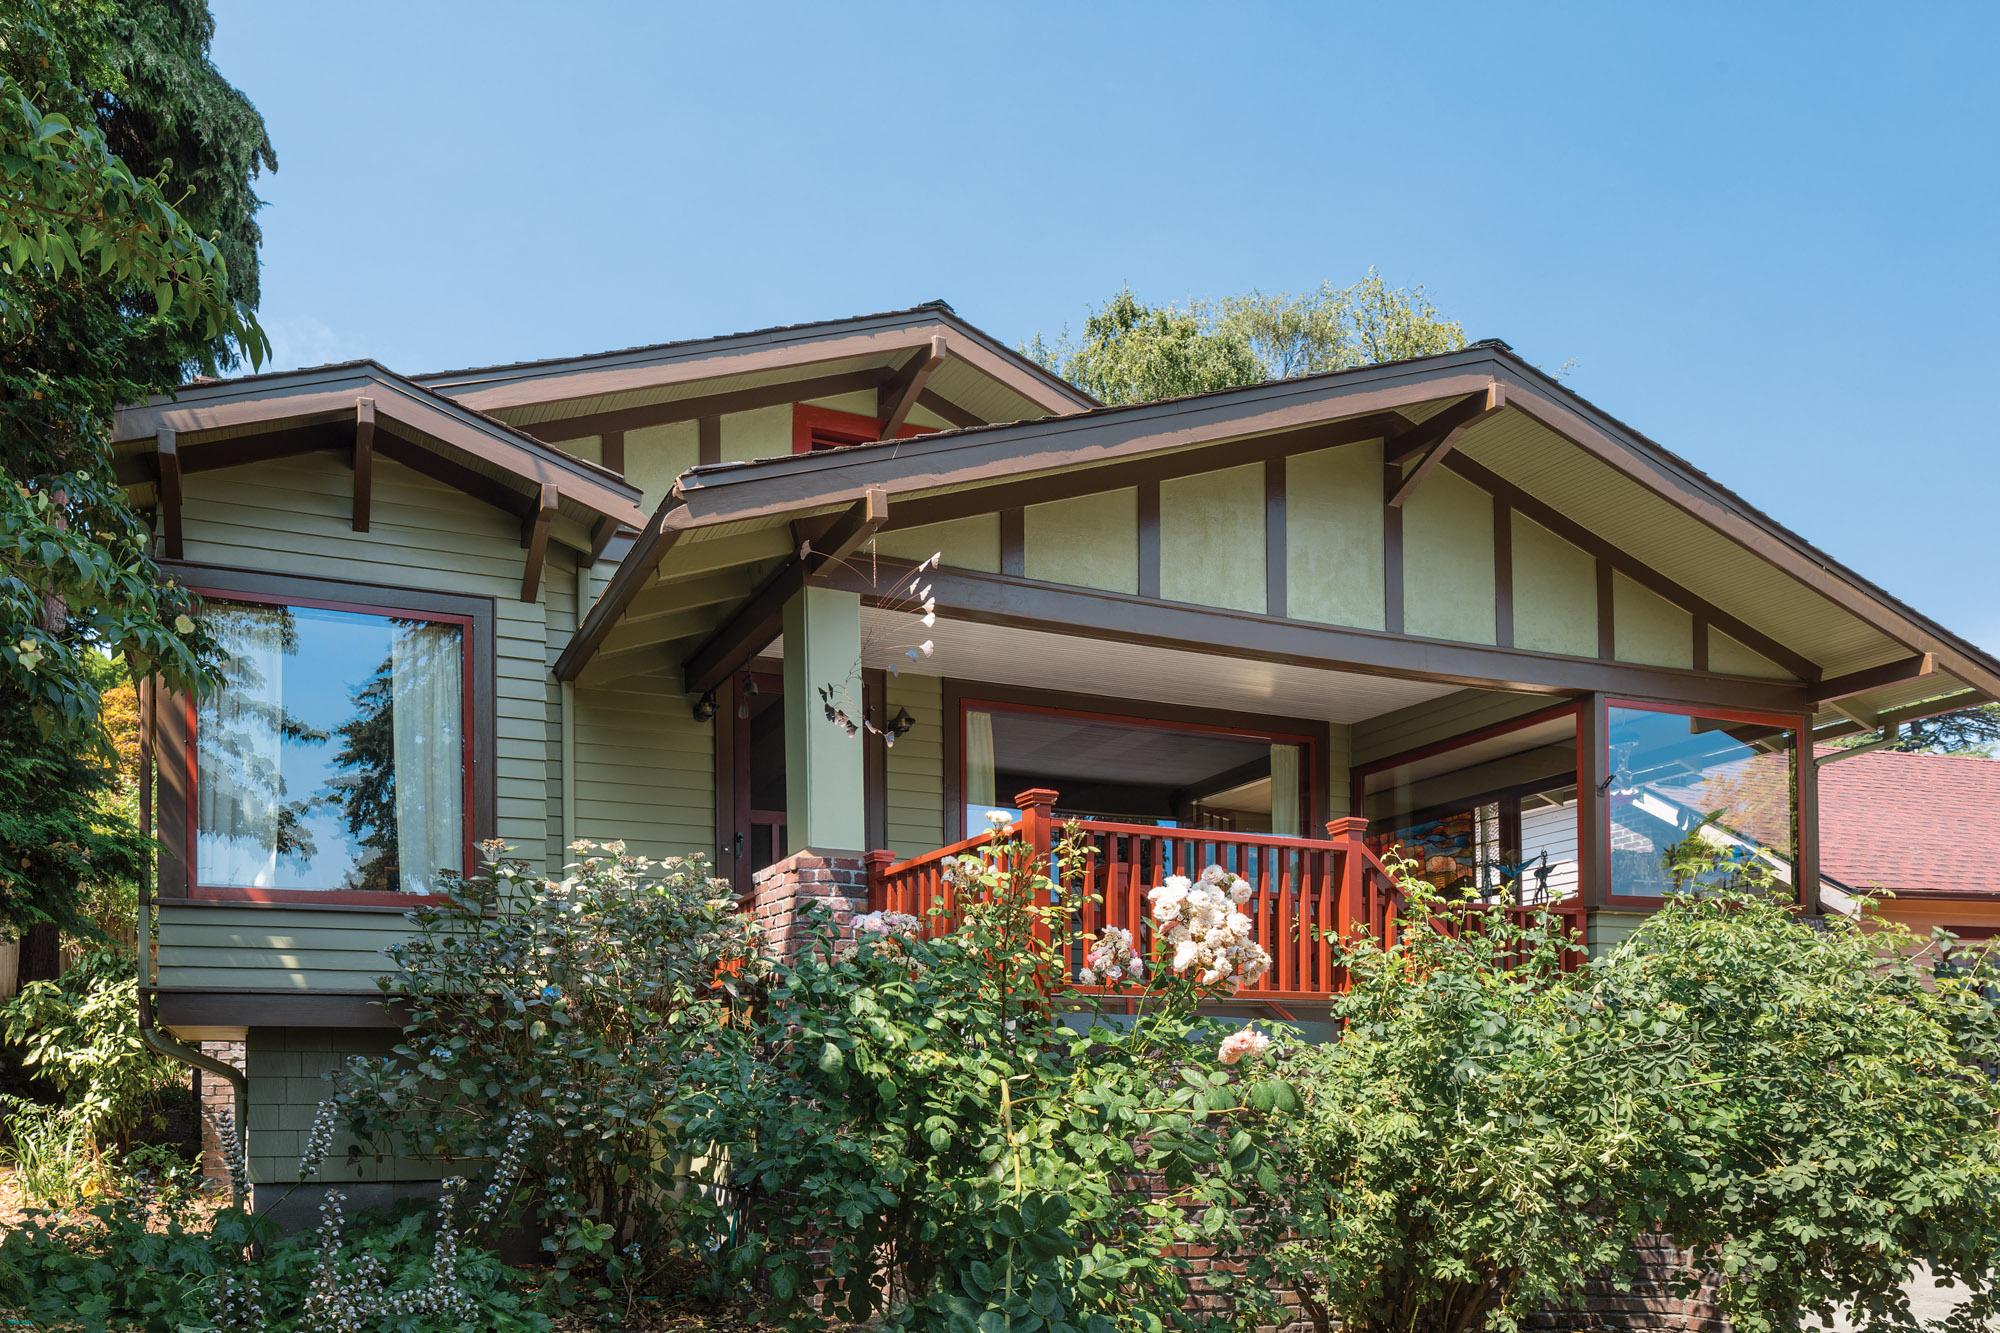 bungalow exterior